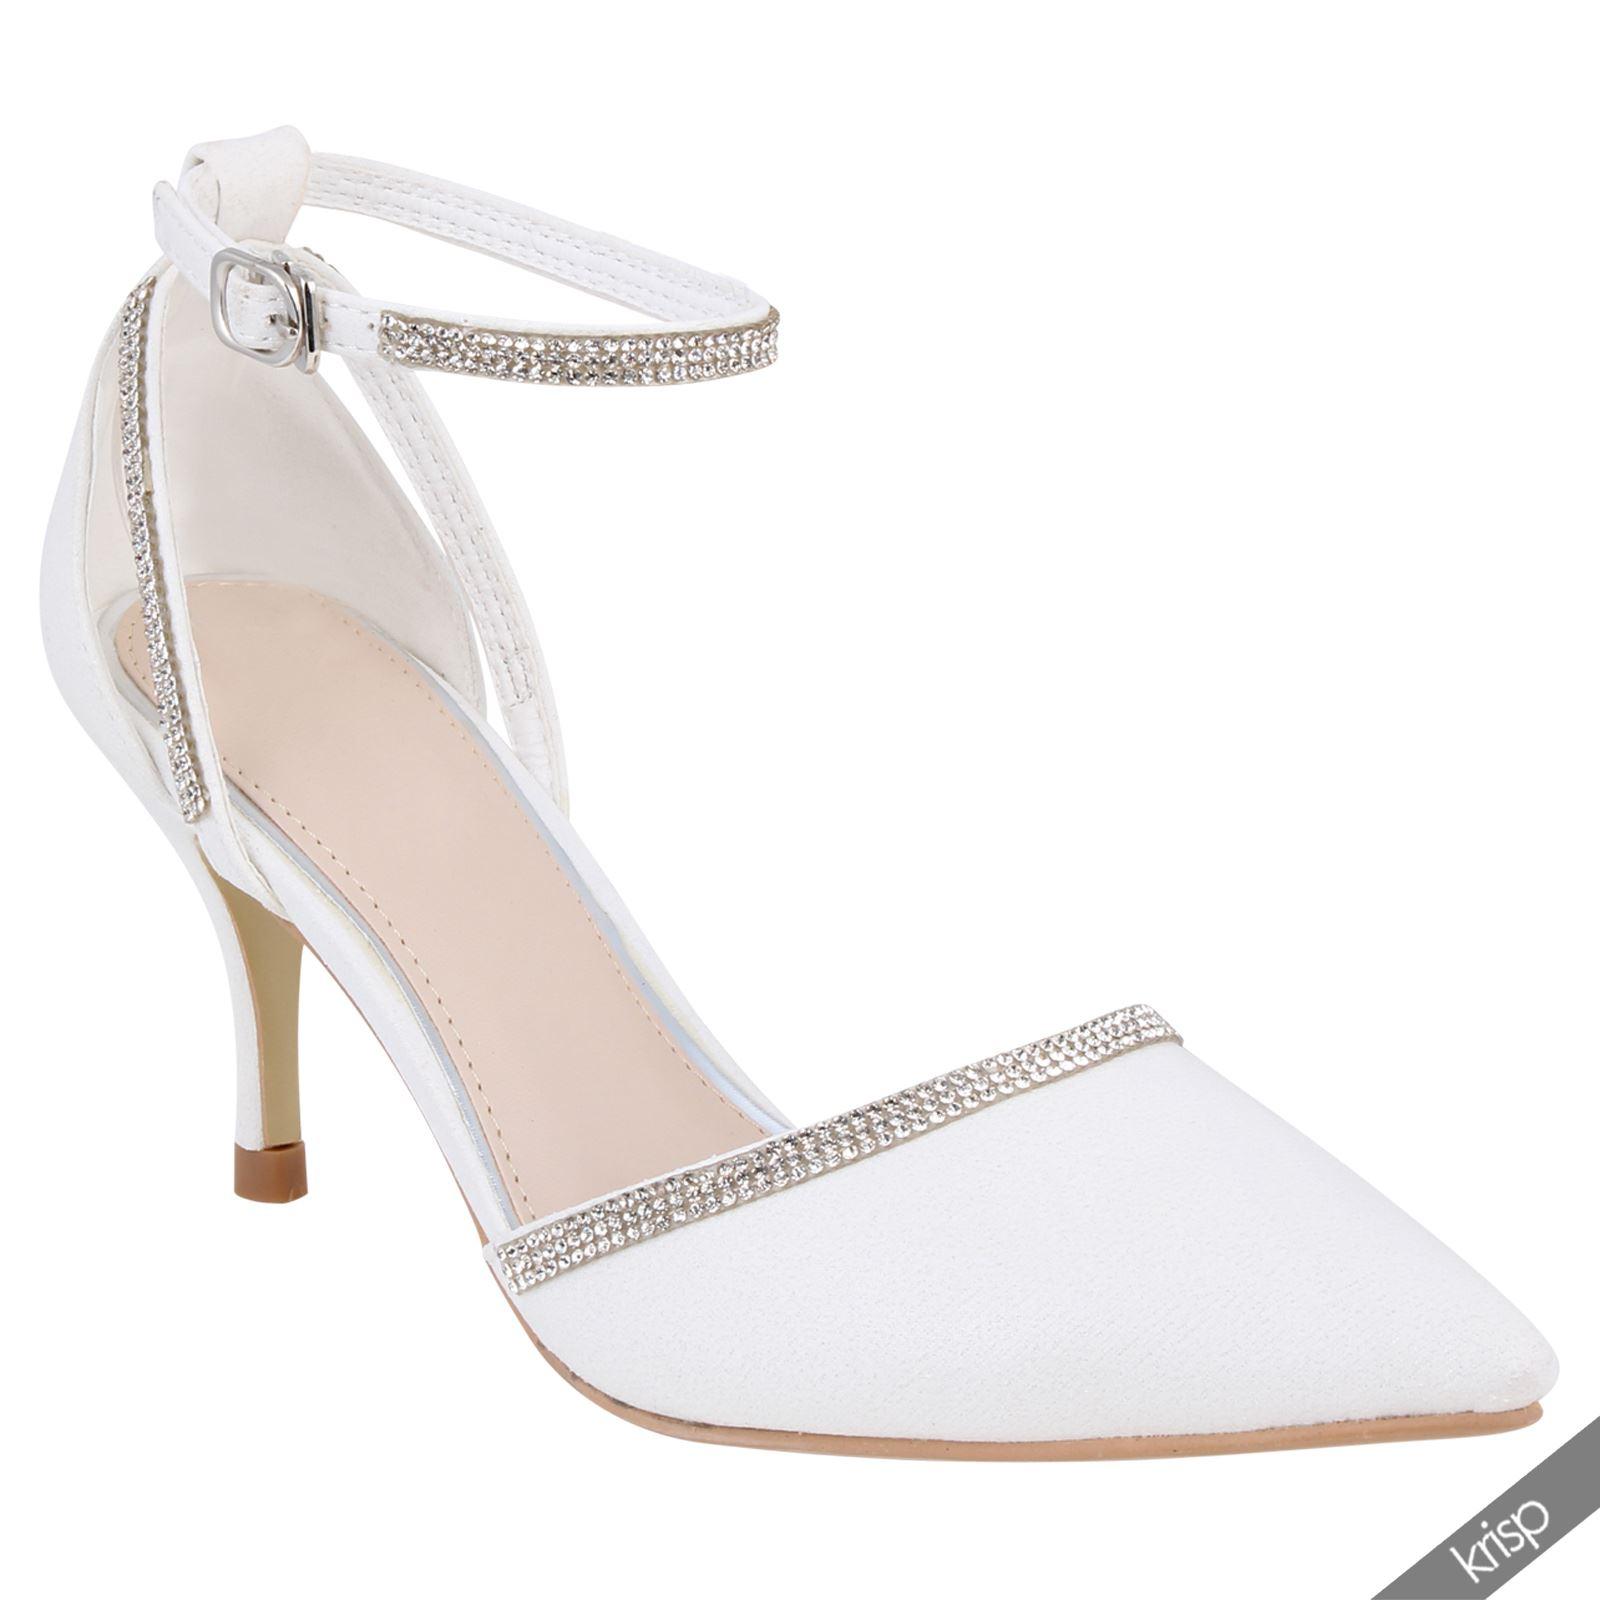 damen wei e pumps high heels sandalen stilettos. Black Bedroom Furniture Sets. Home Design Ideas